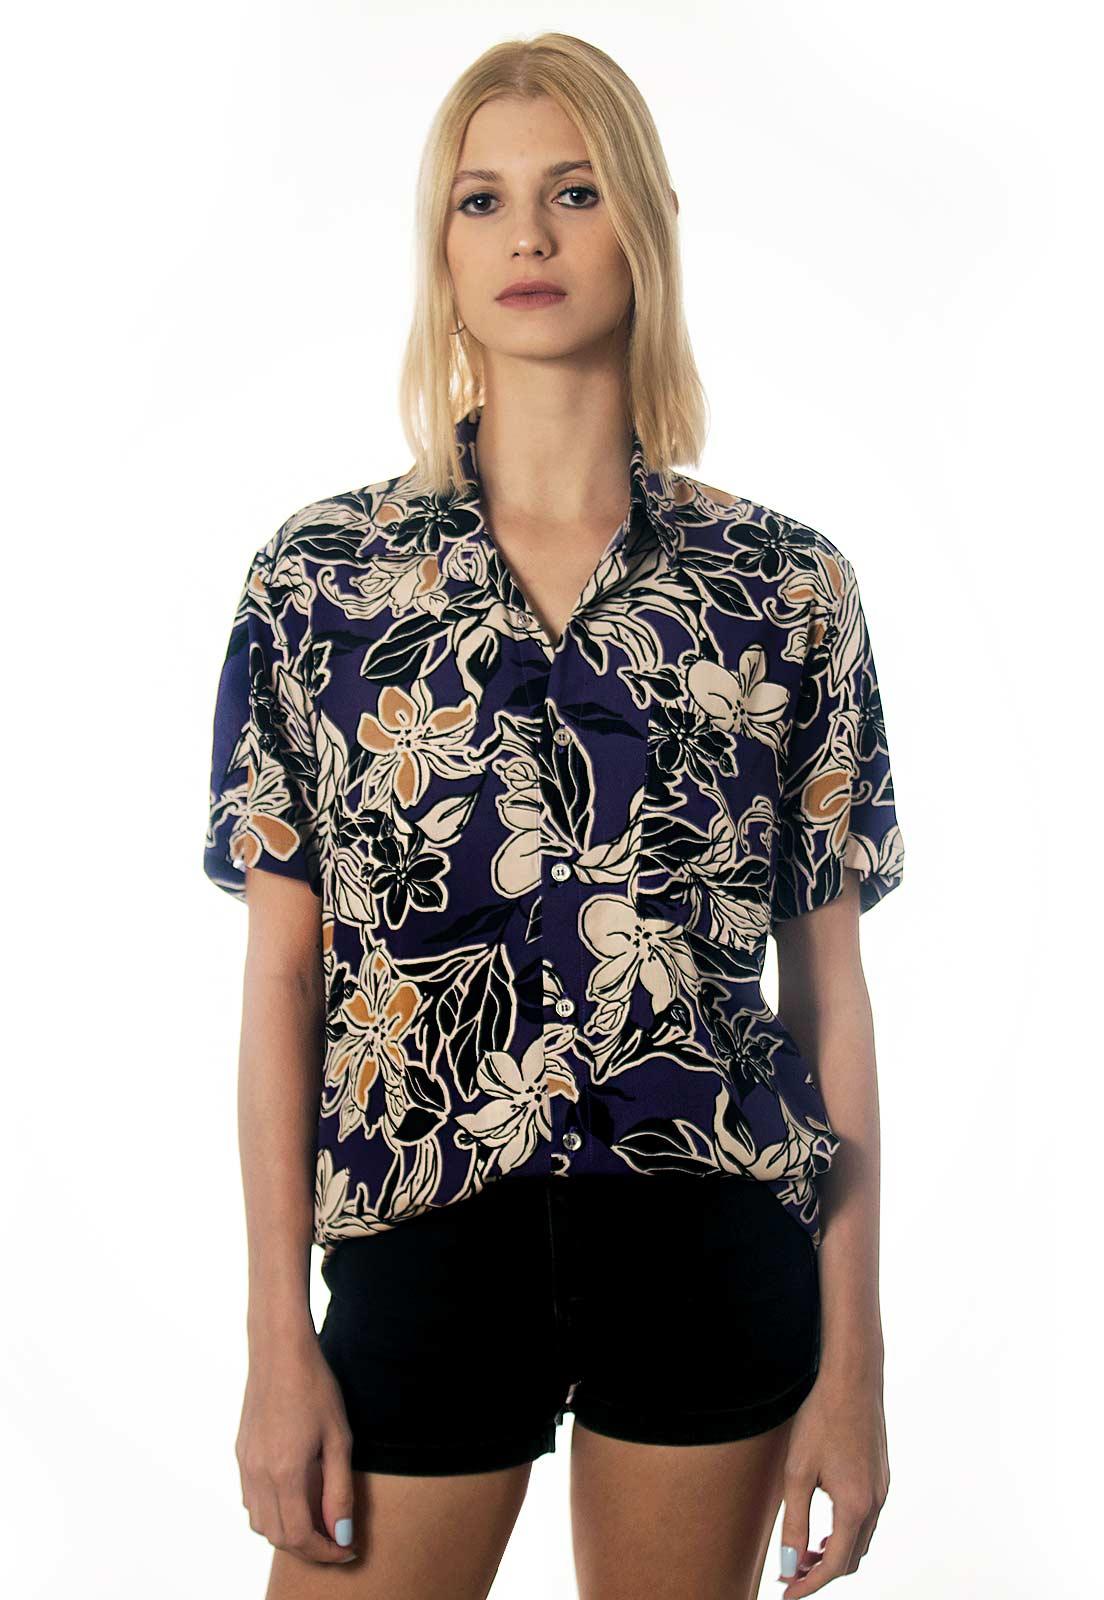 Camisa Folhagens Estampada ElephunK Noronha Roxa